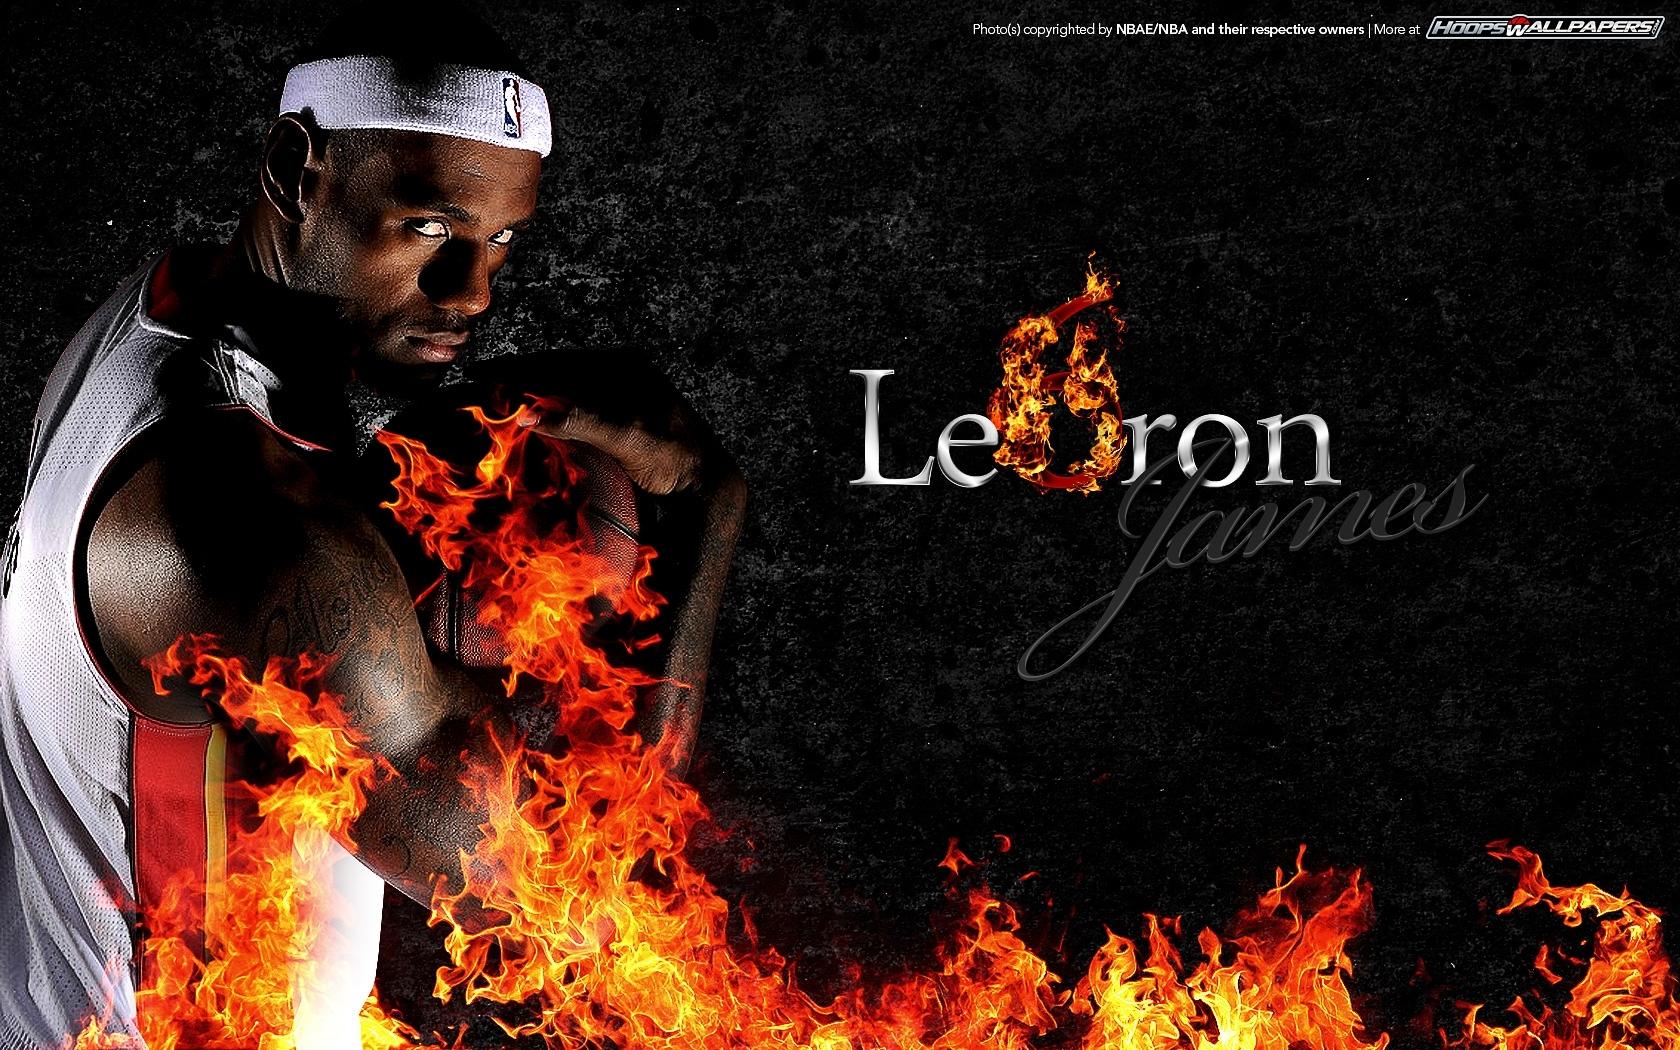 lebron james wallpaper hd for desktop, iphone & mobile